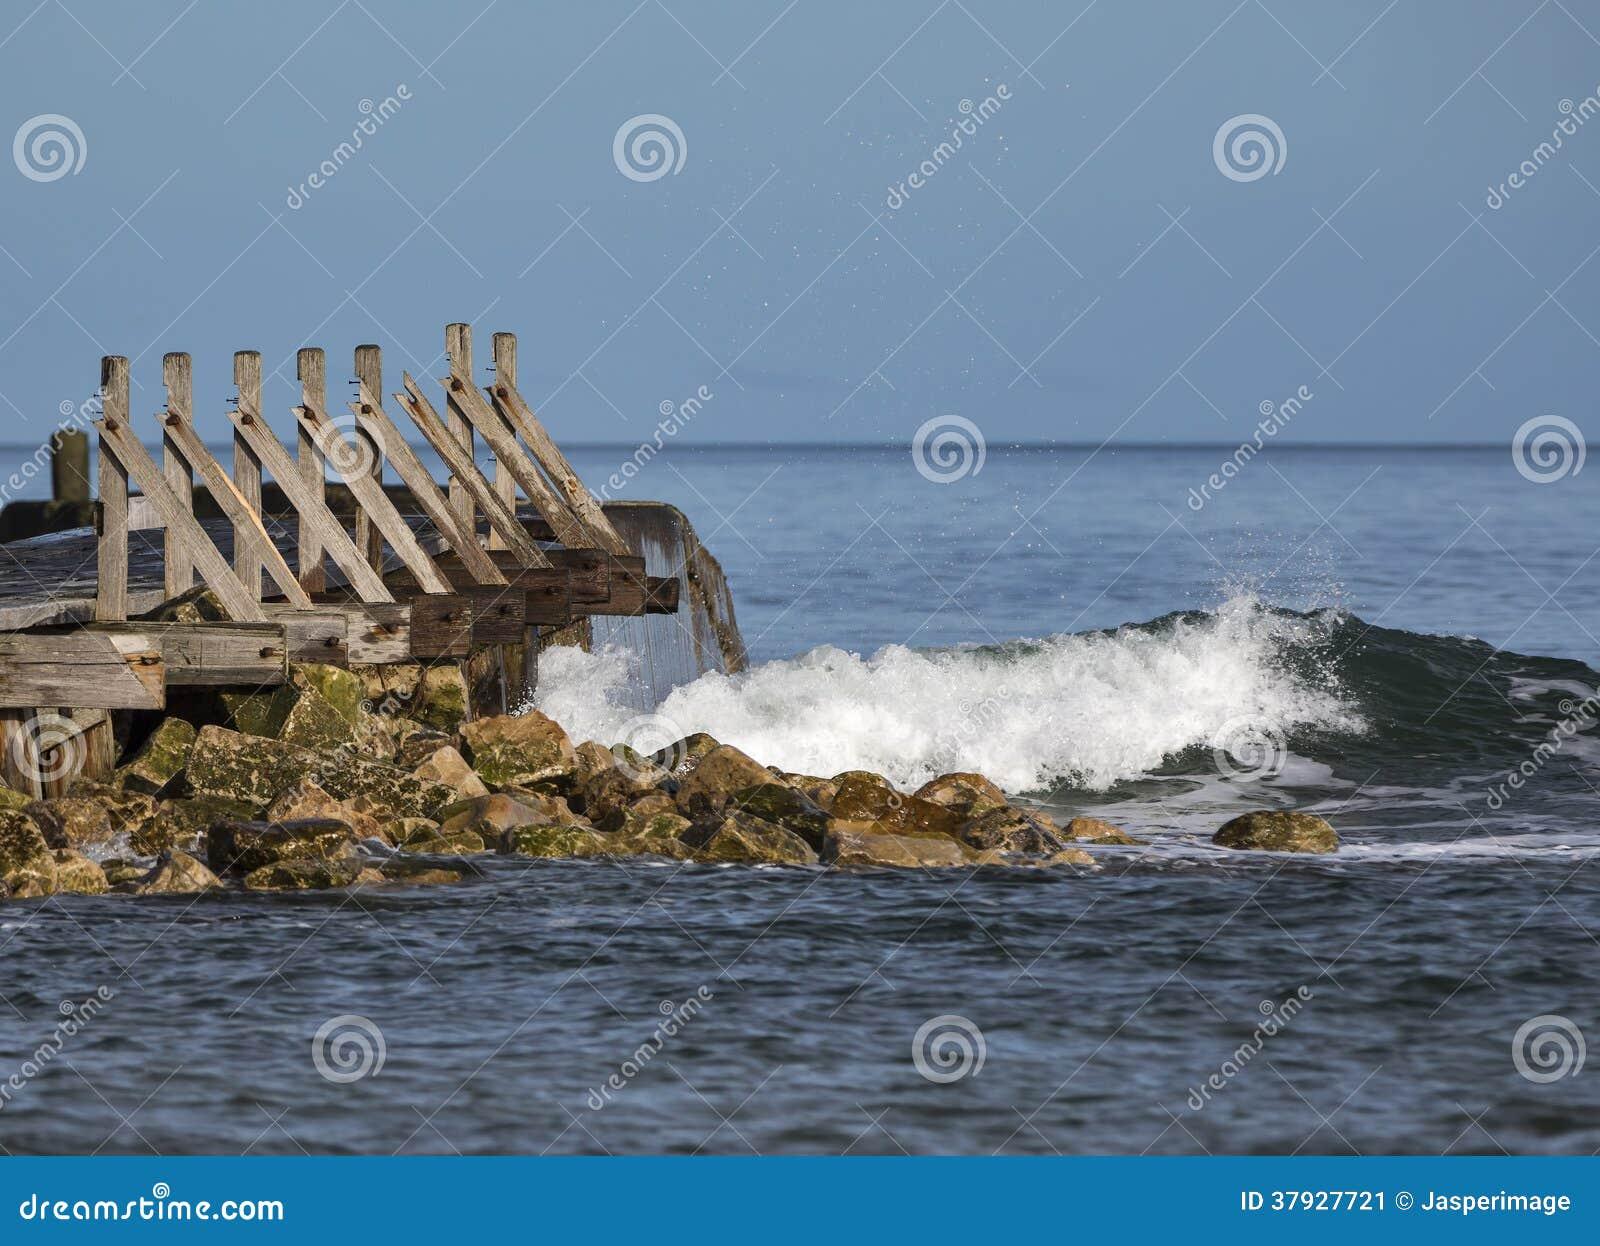 Auffallender Wellenbrecher Lossiemouth-Welle.